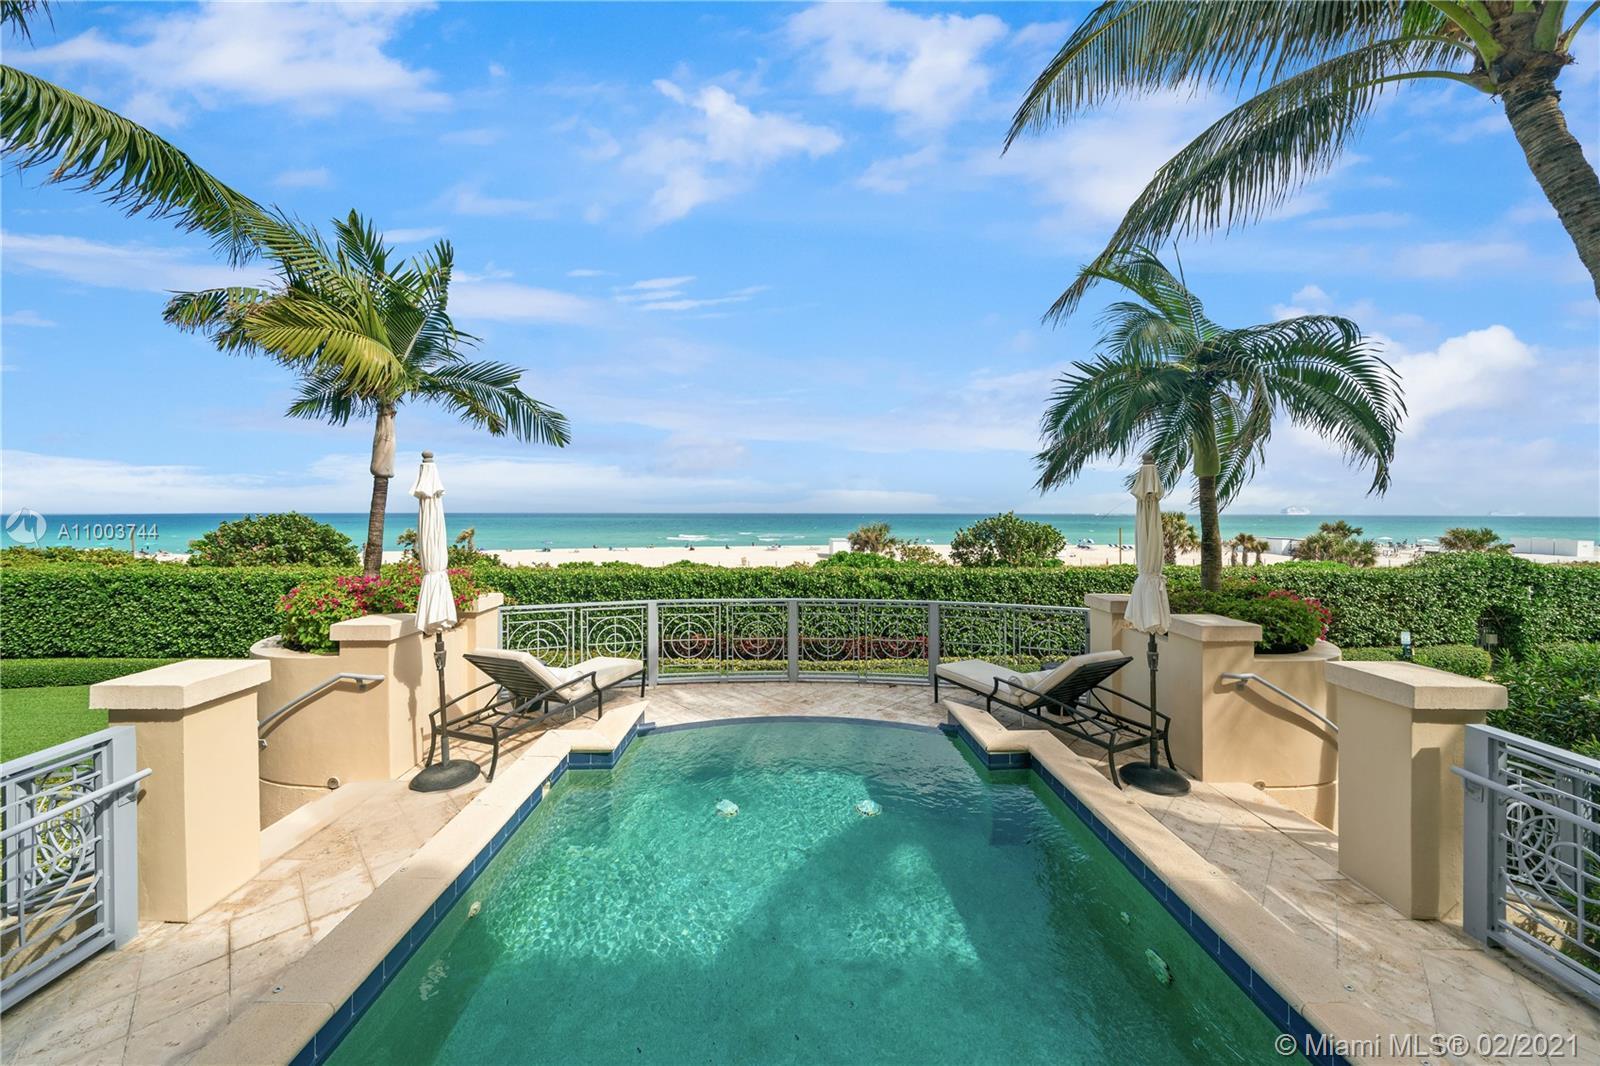 5959 Collins Ave, Unit #Villa 3005 Luxury Real Estate